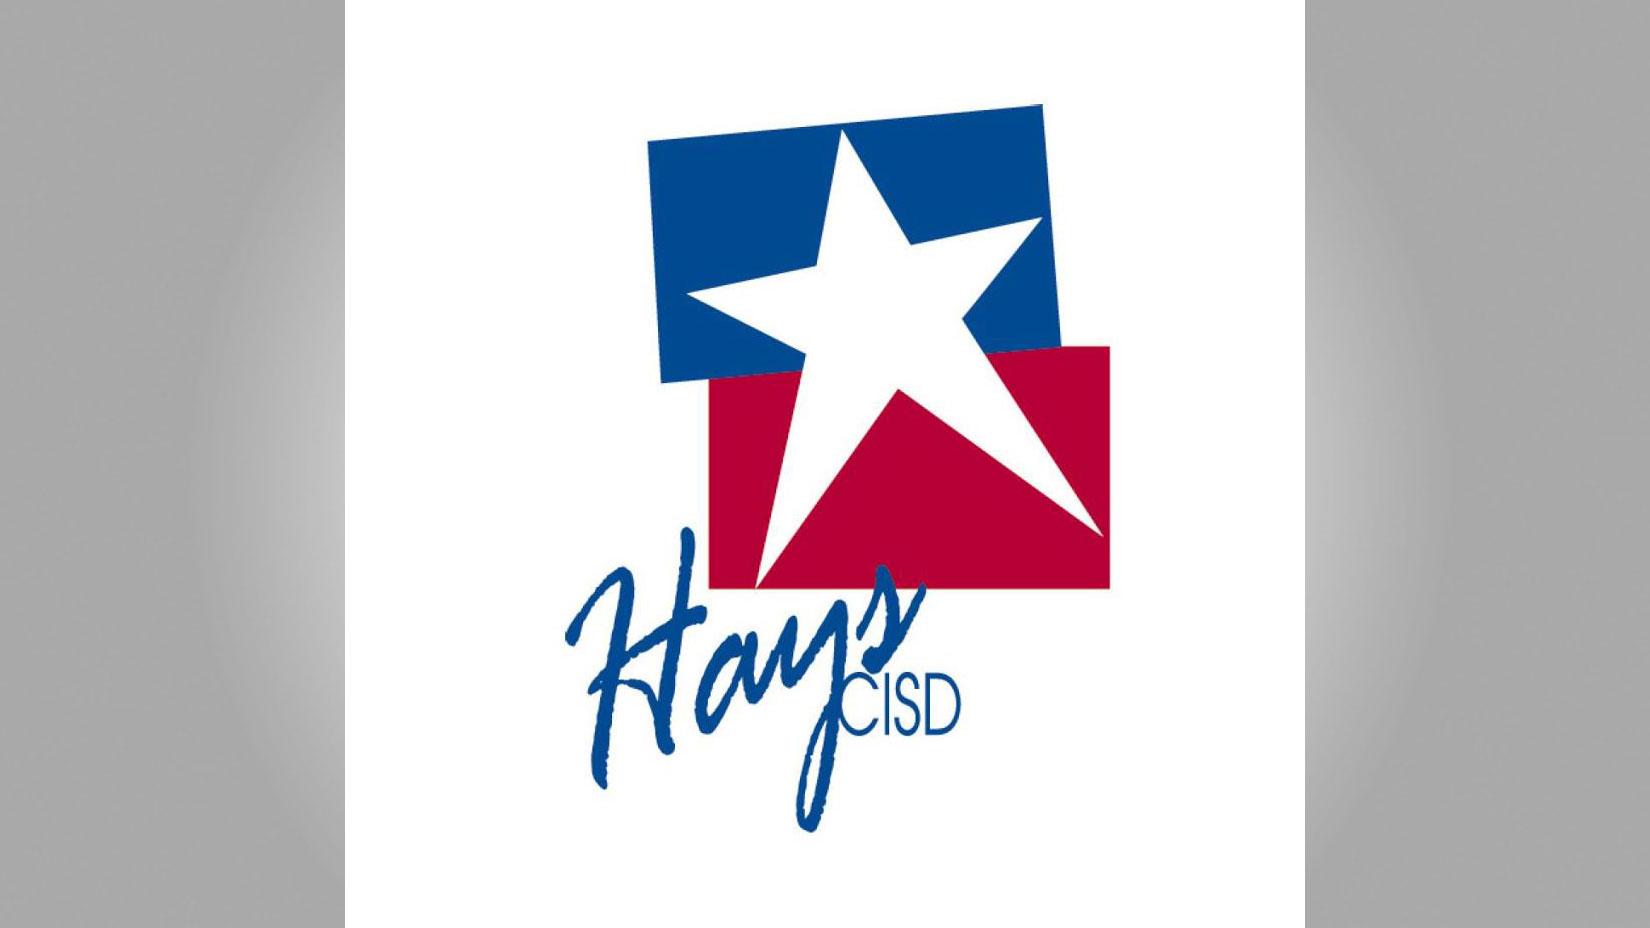 Hays CISD Board calls for $250M bond election | KVUE.com